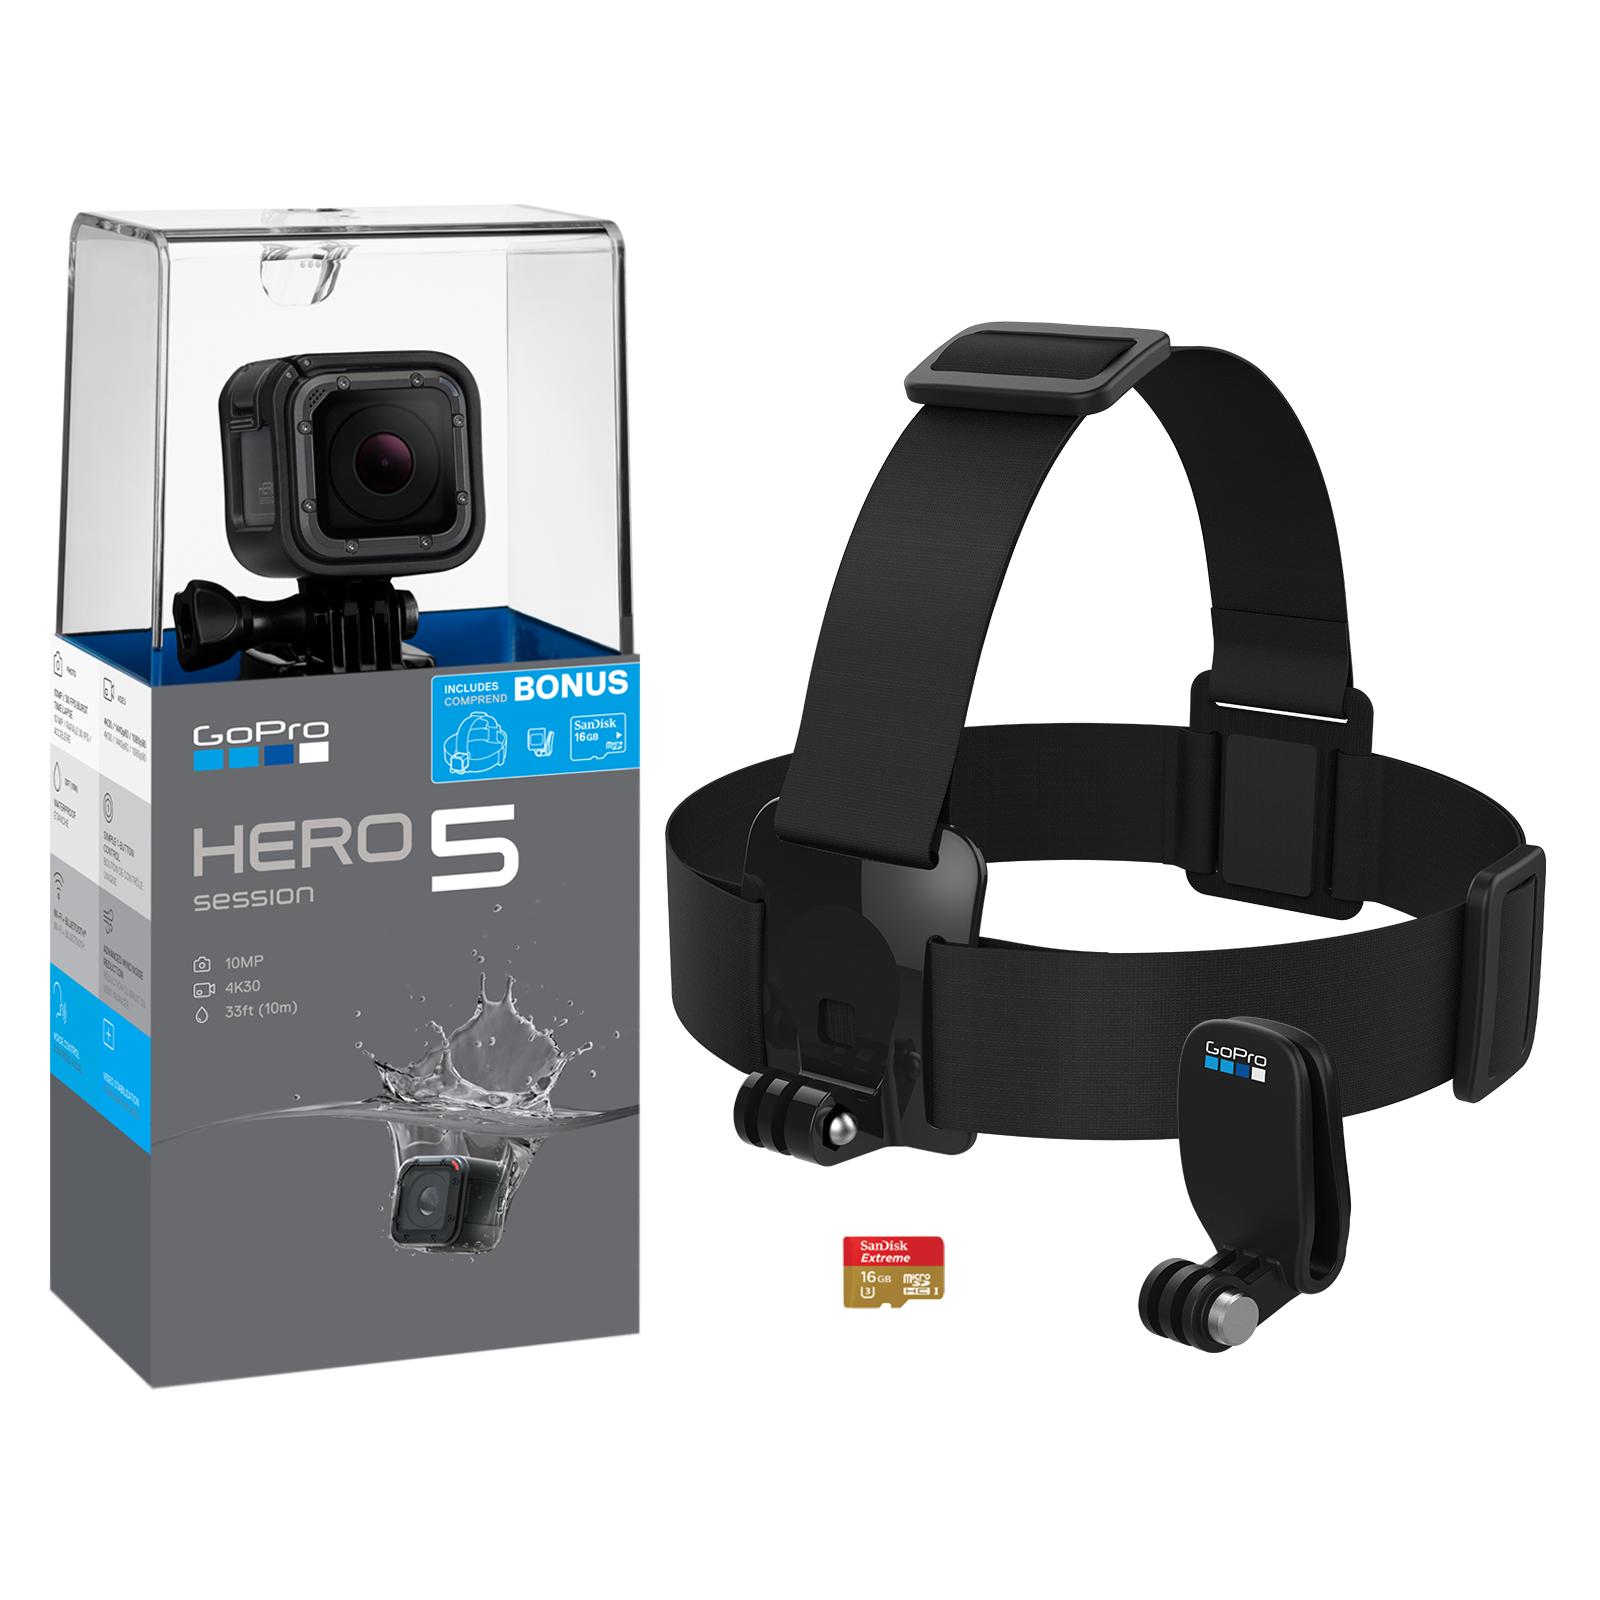 Buy GoPro HERO5 Session Bundle at Walmart.com  7e15ad945493